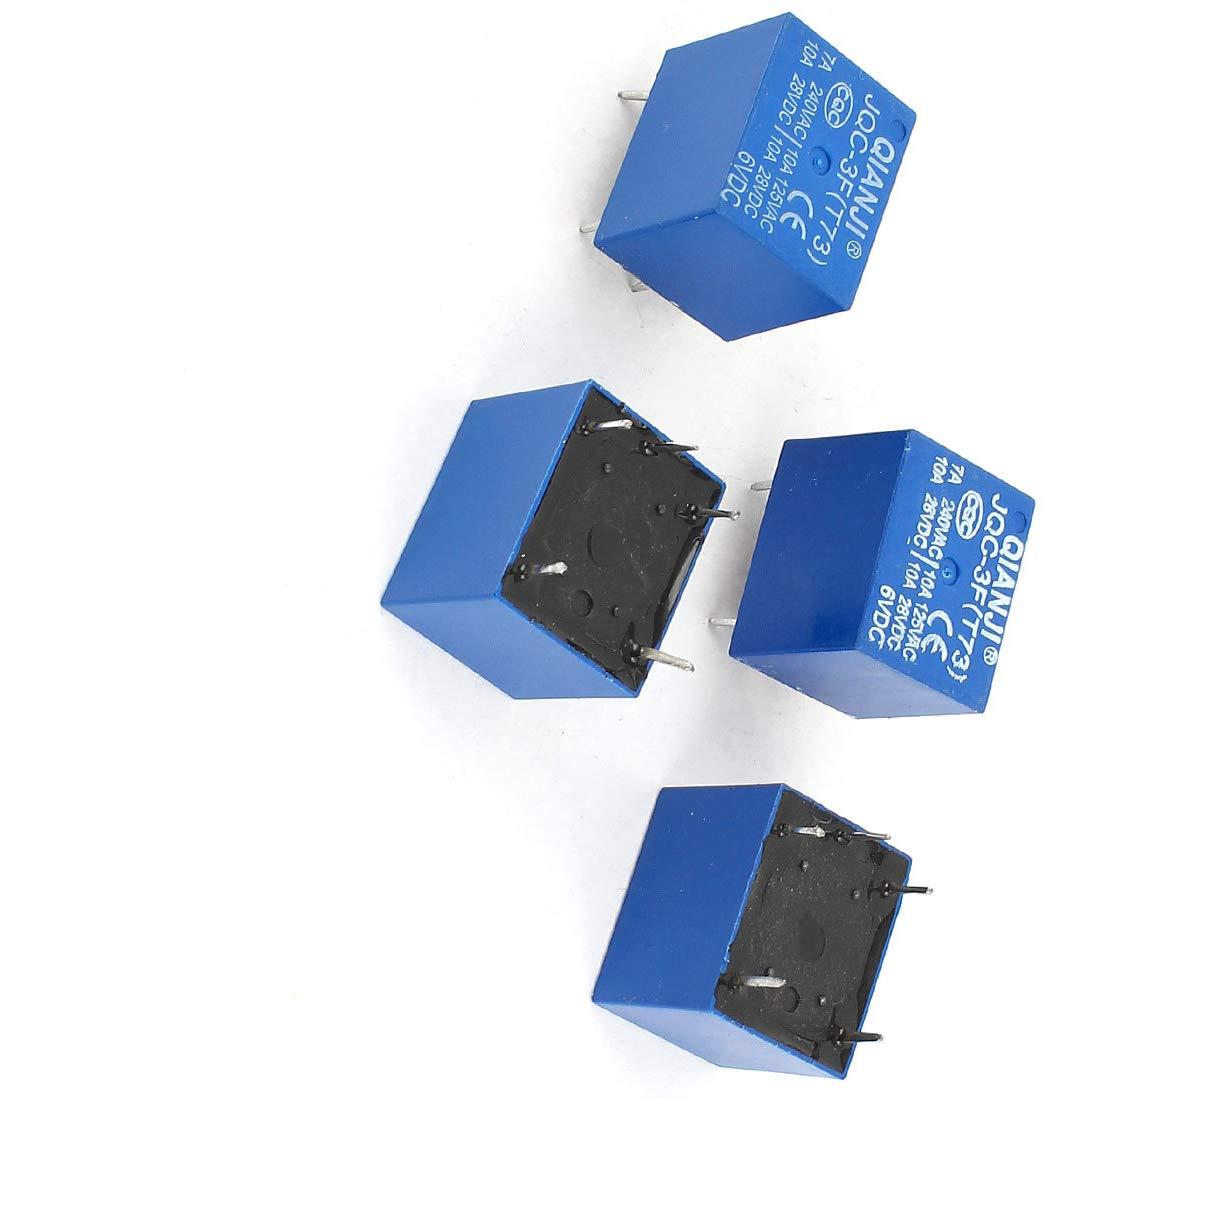 Aexit 4 x JQC-3F T73 531334 5Pin Rel/è di potenza SPST DC 6V Bobina 28 V CA 125 V 240 V Carico ID